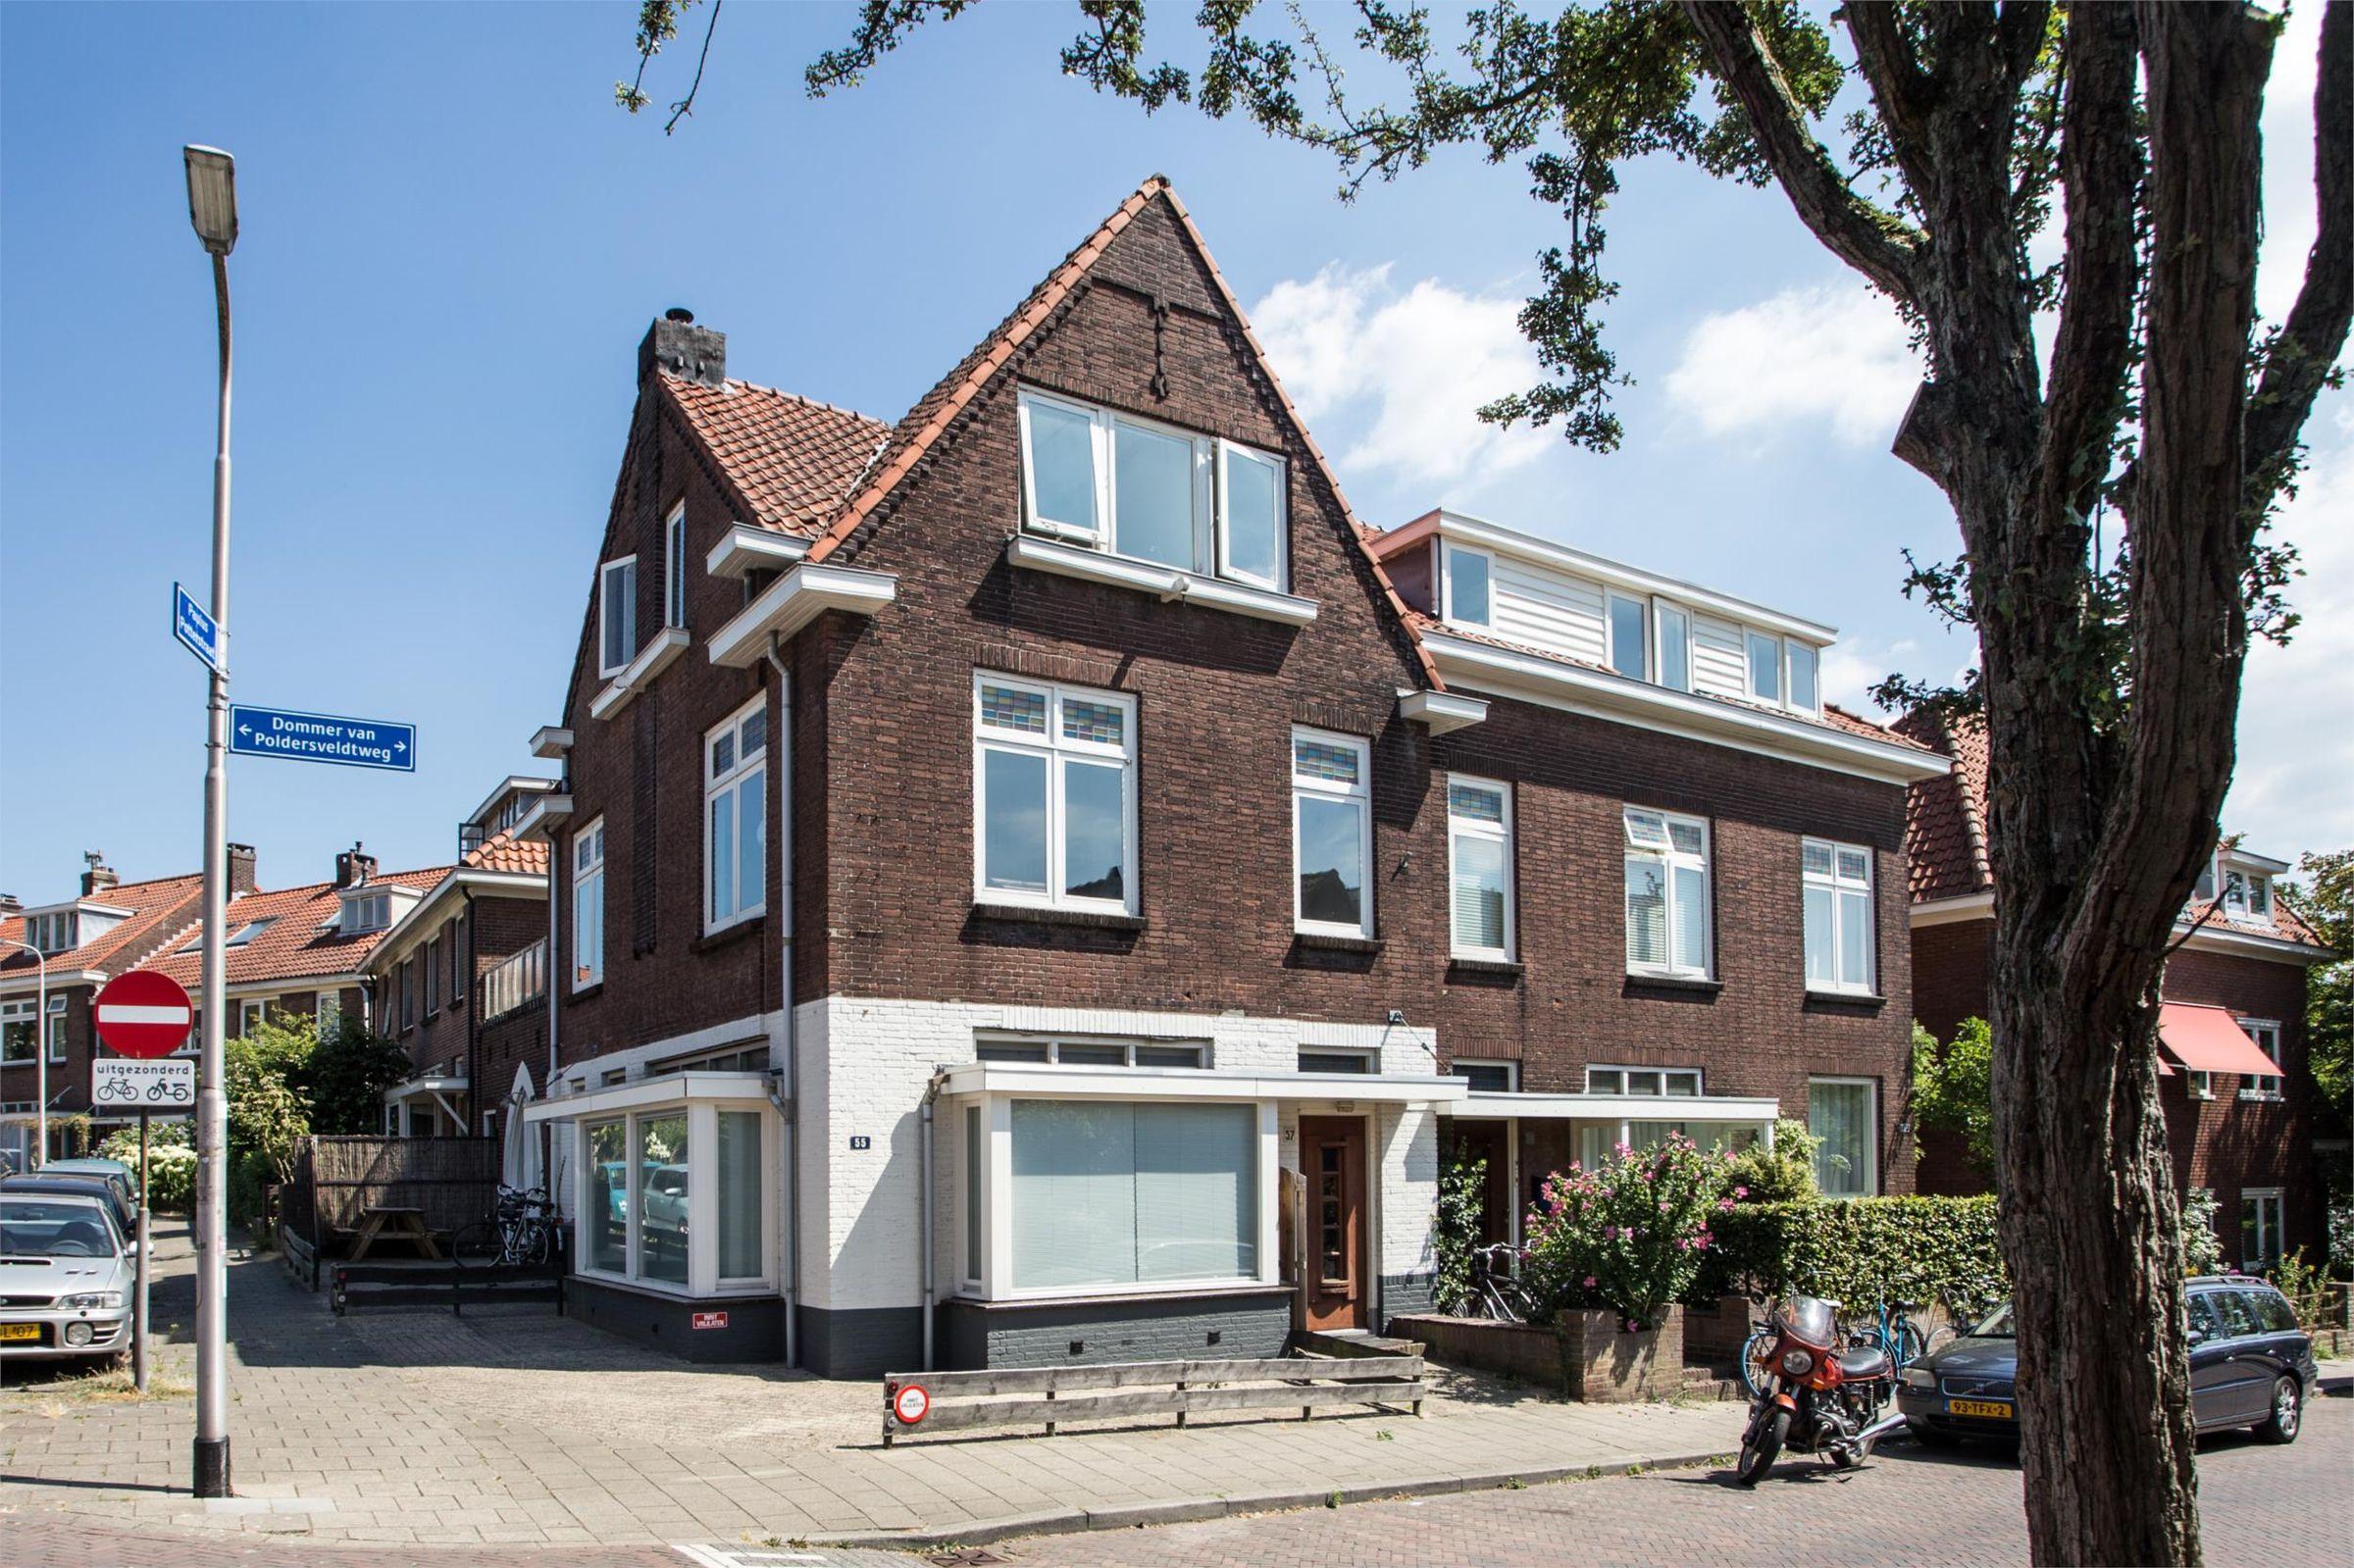 Dommer van Poldersveldtweg 57, Nijmegen